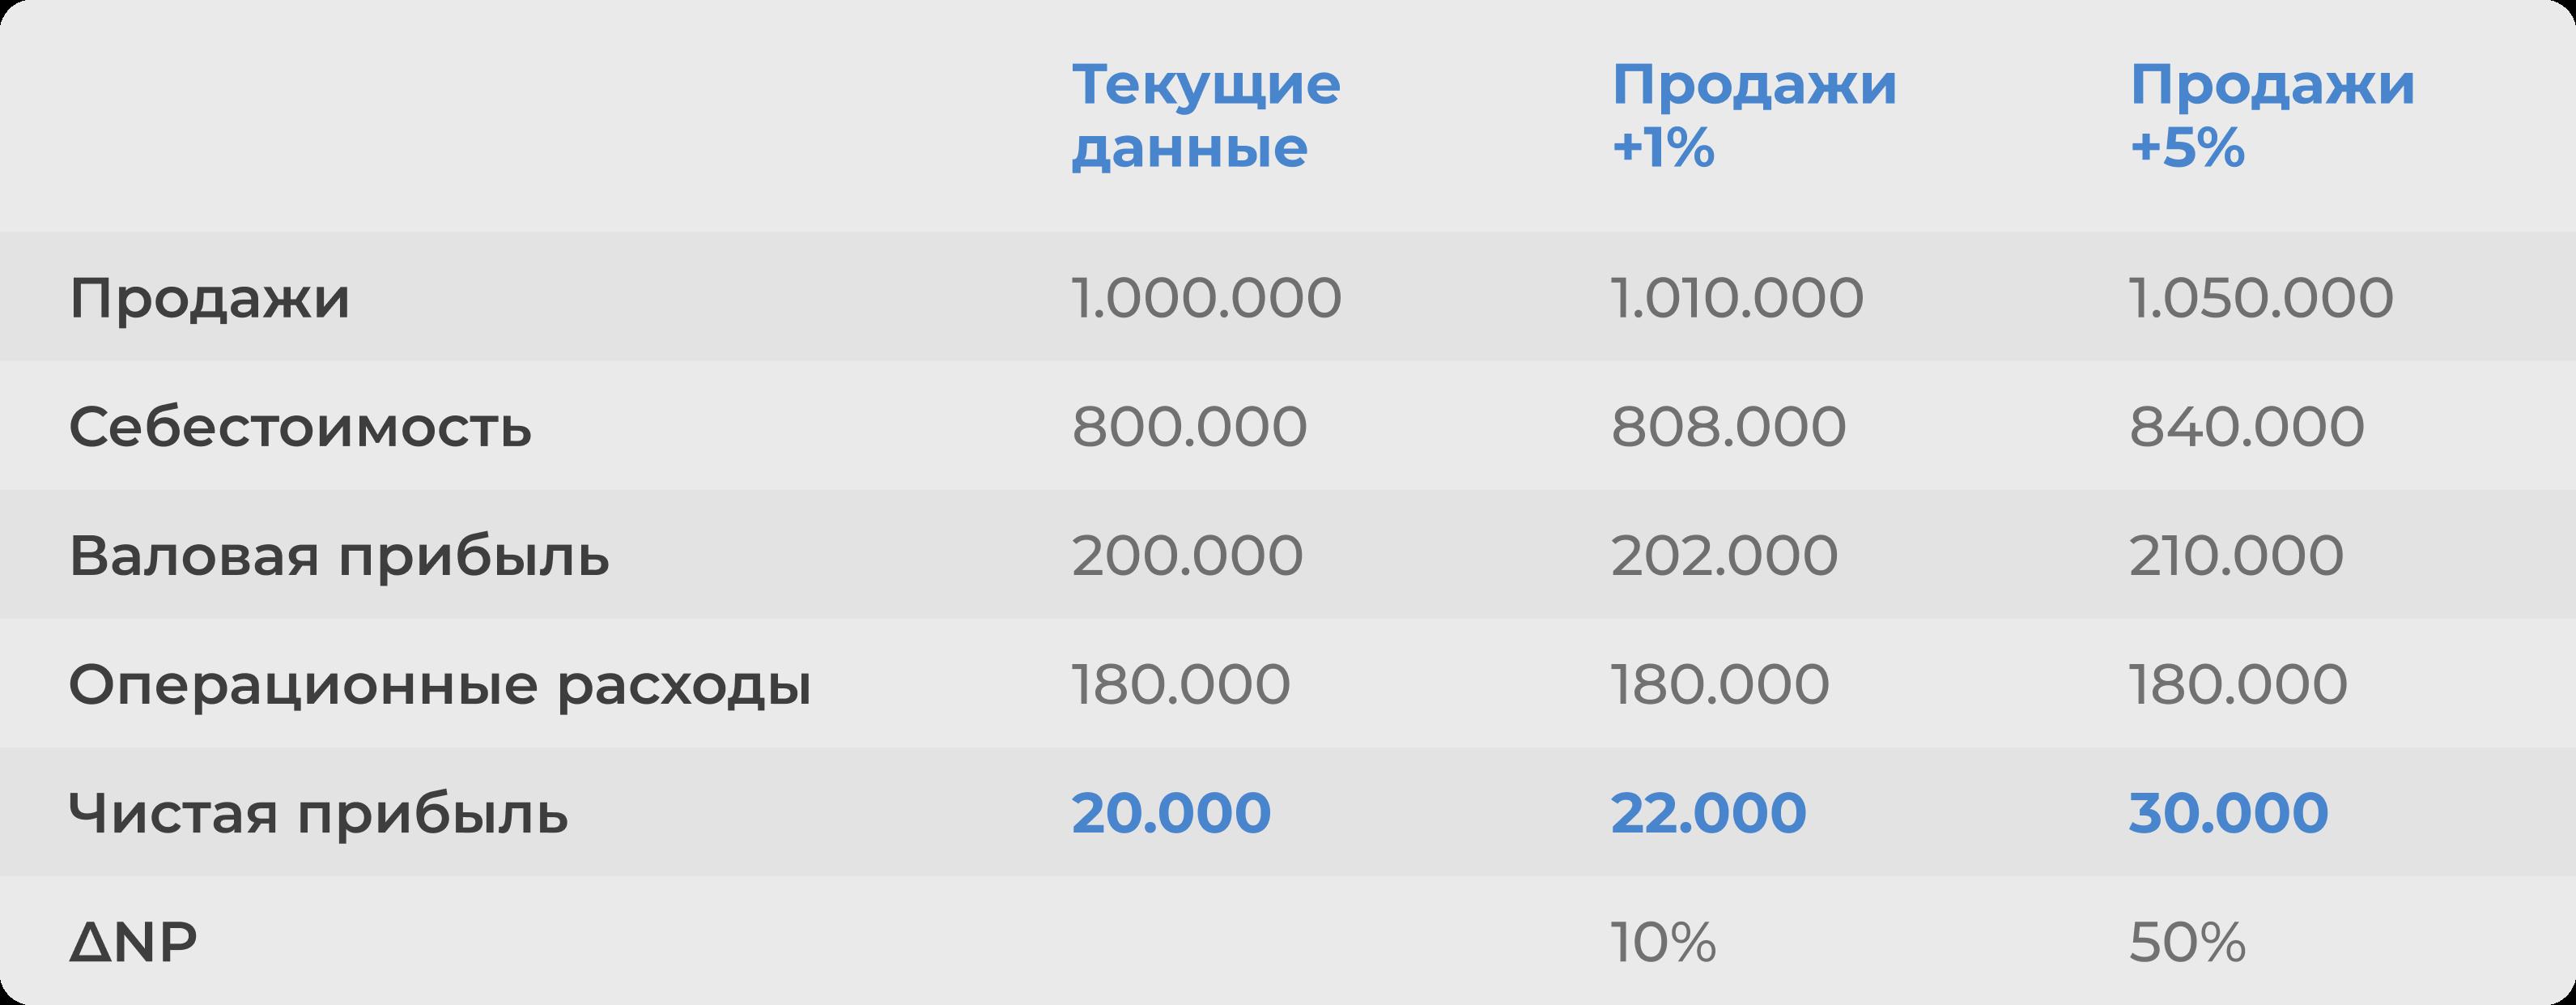 Увеличение продаж сети на 1% и на 5%